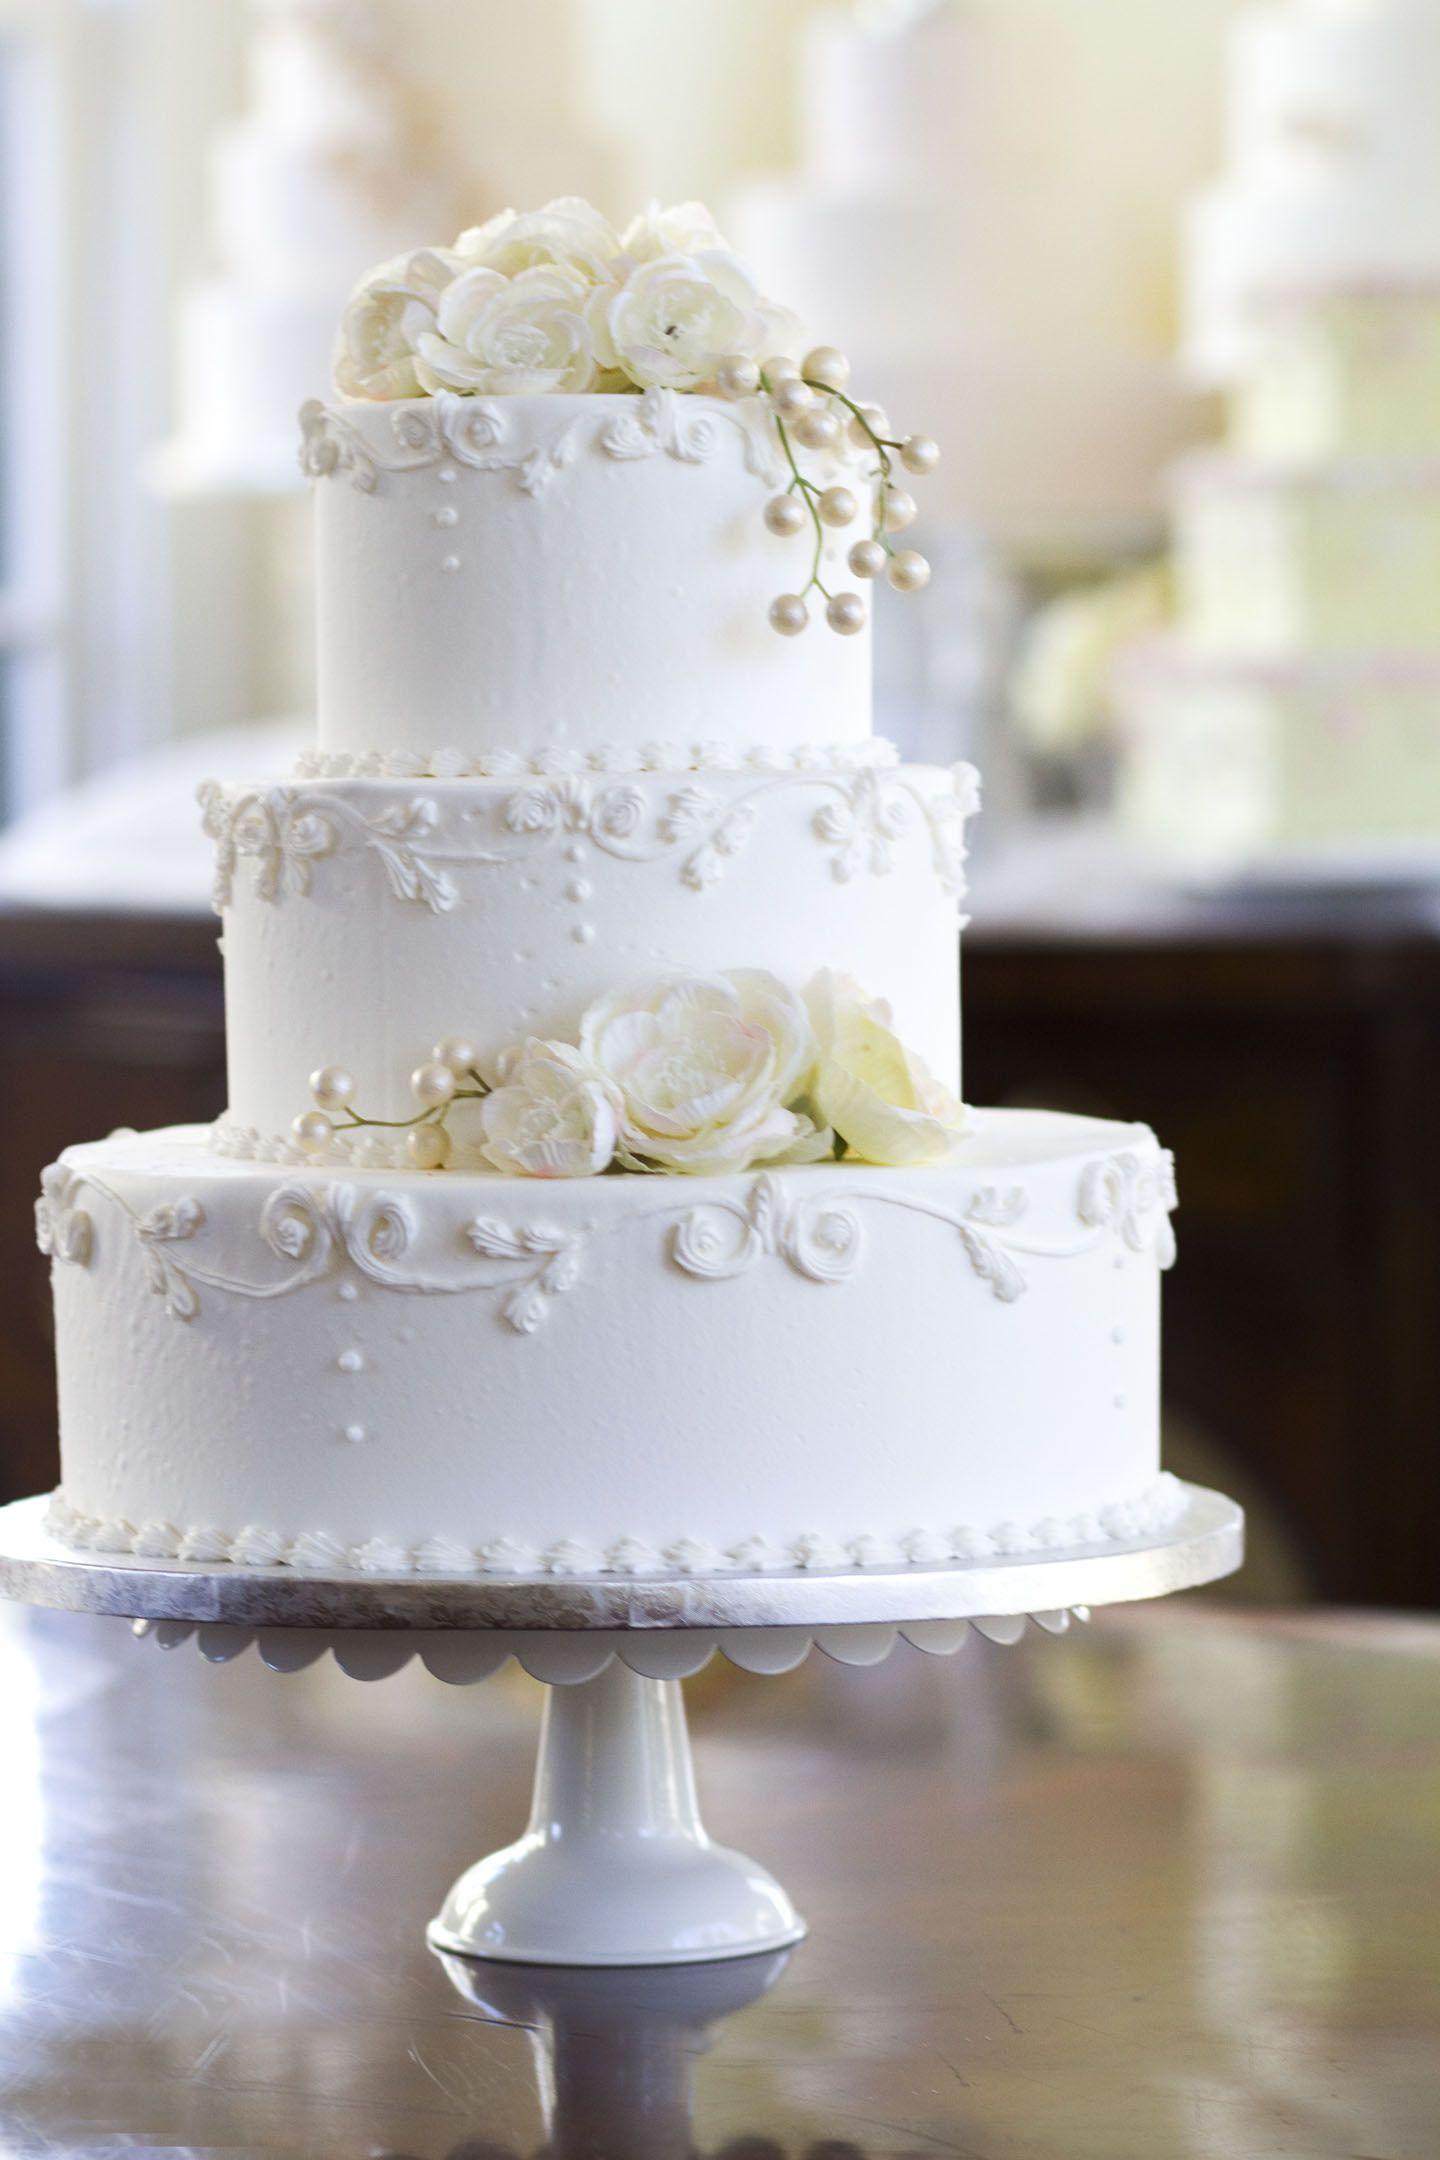 Pin by angeles costa caldera on tartas espectaculares y cupcakes